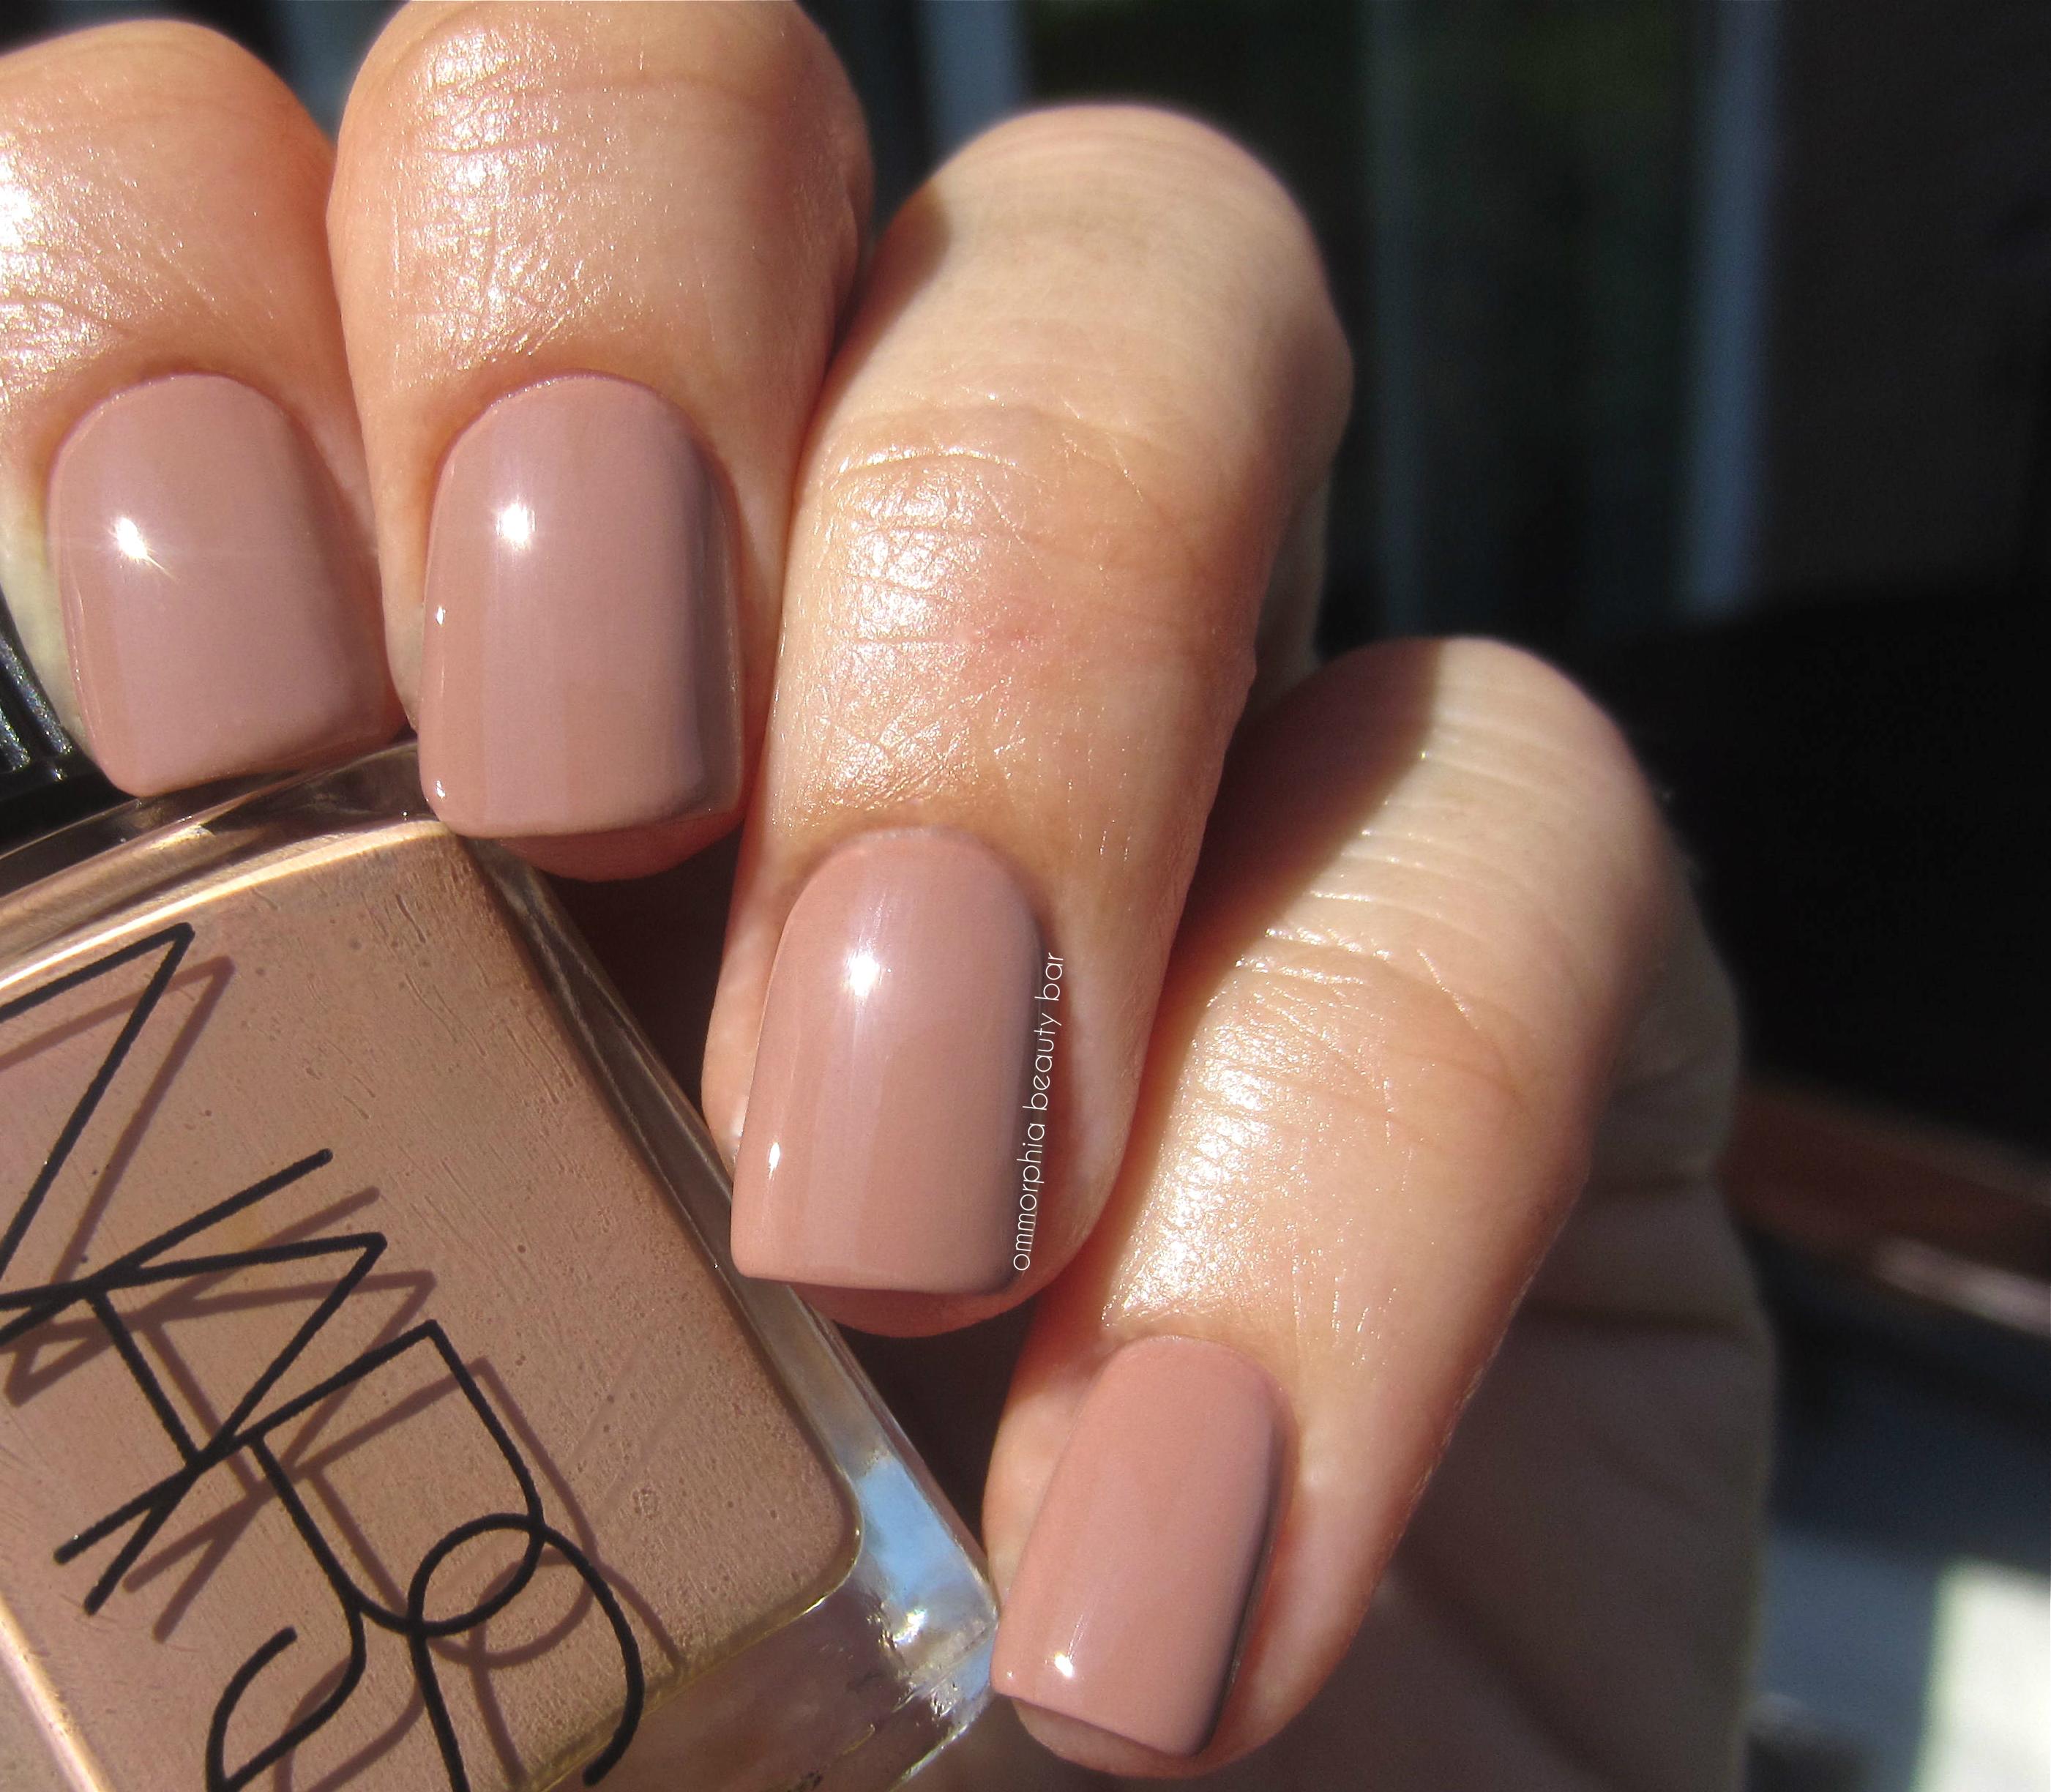 NARS | Nail Polish 2014, reformulated | ommorphia beauty bar